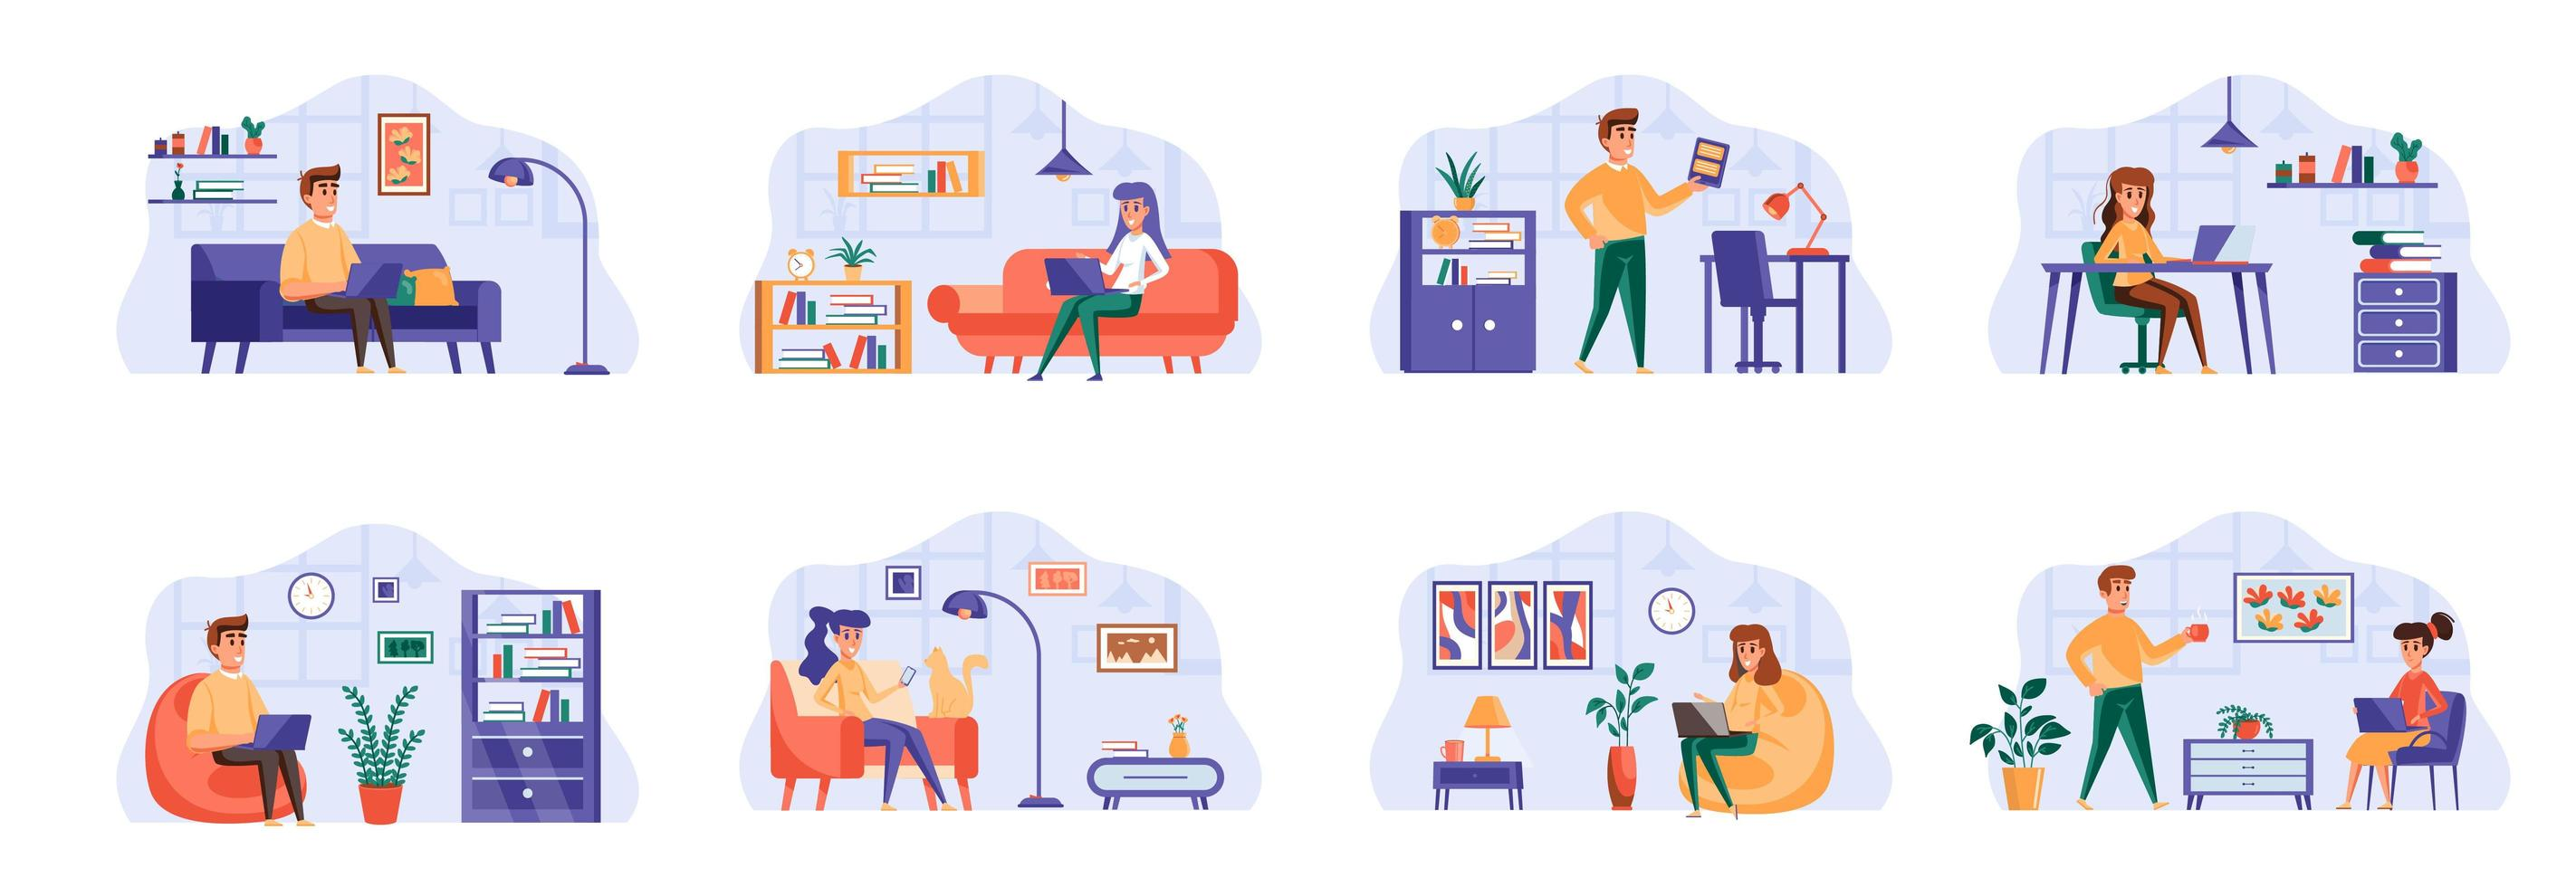 bundel freelance werkscènes met mensenpersonages. vector